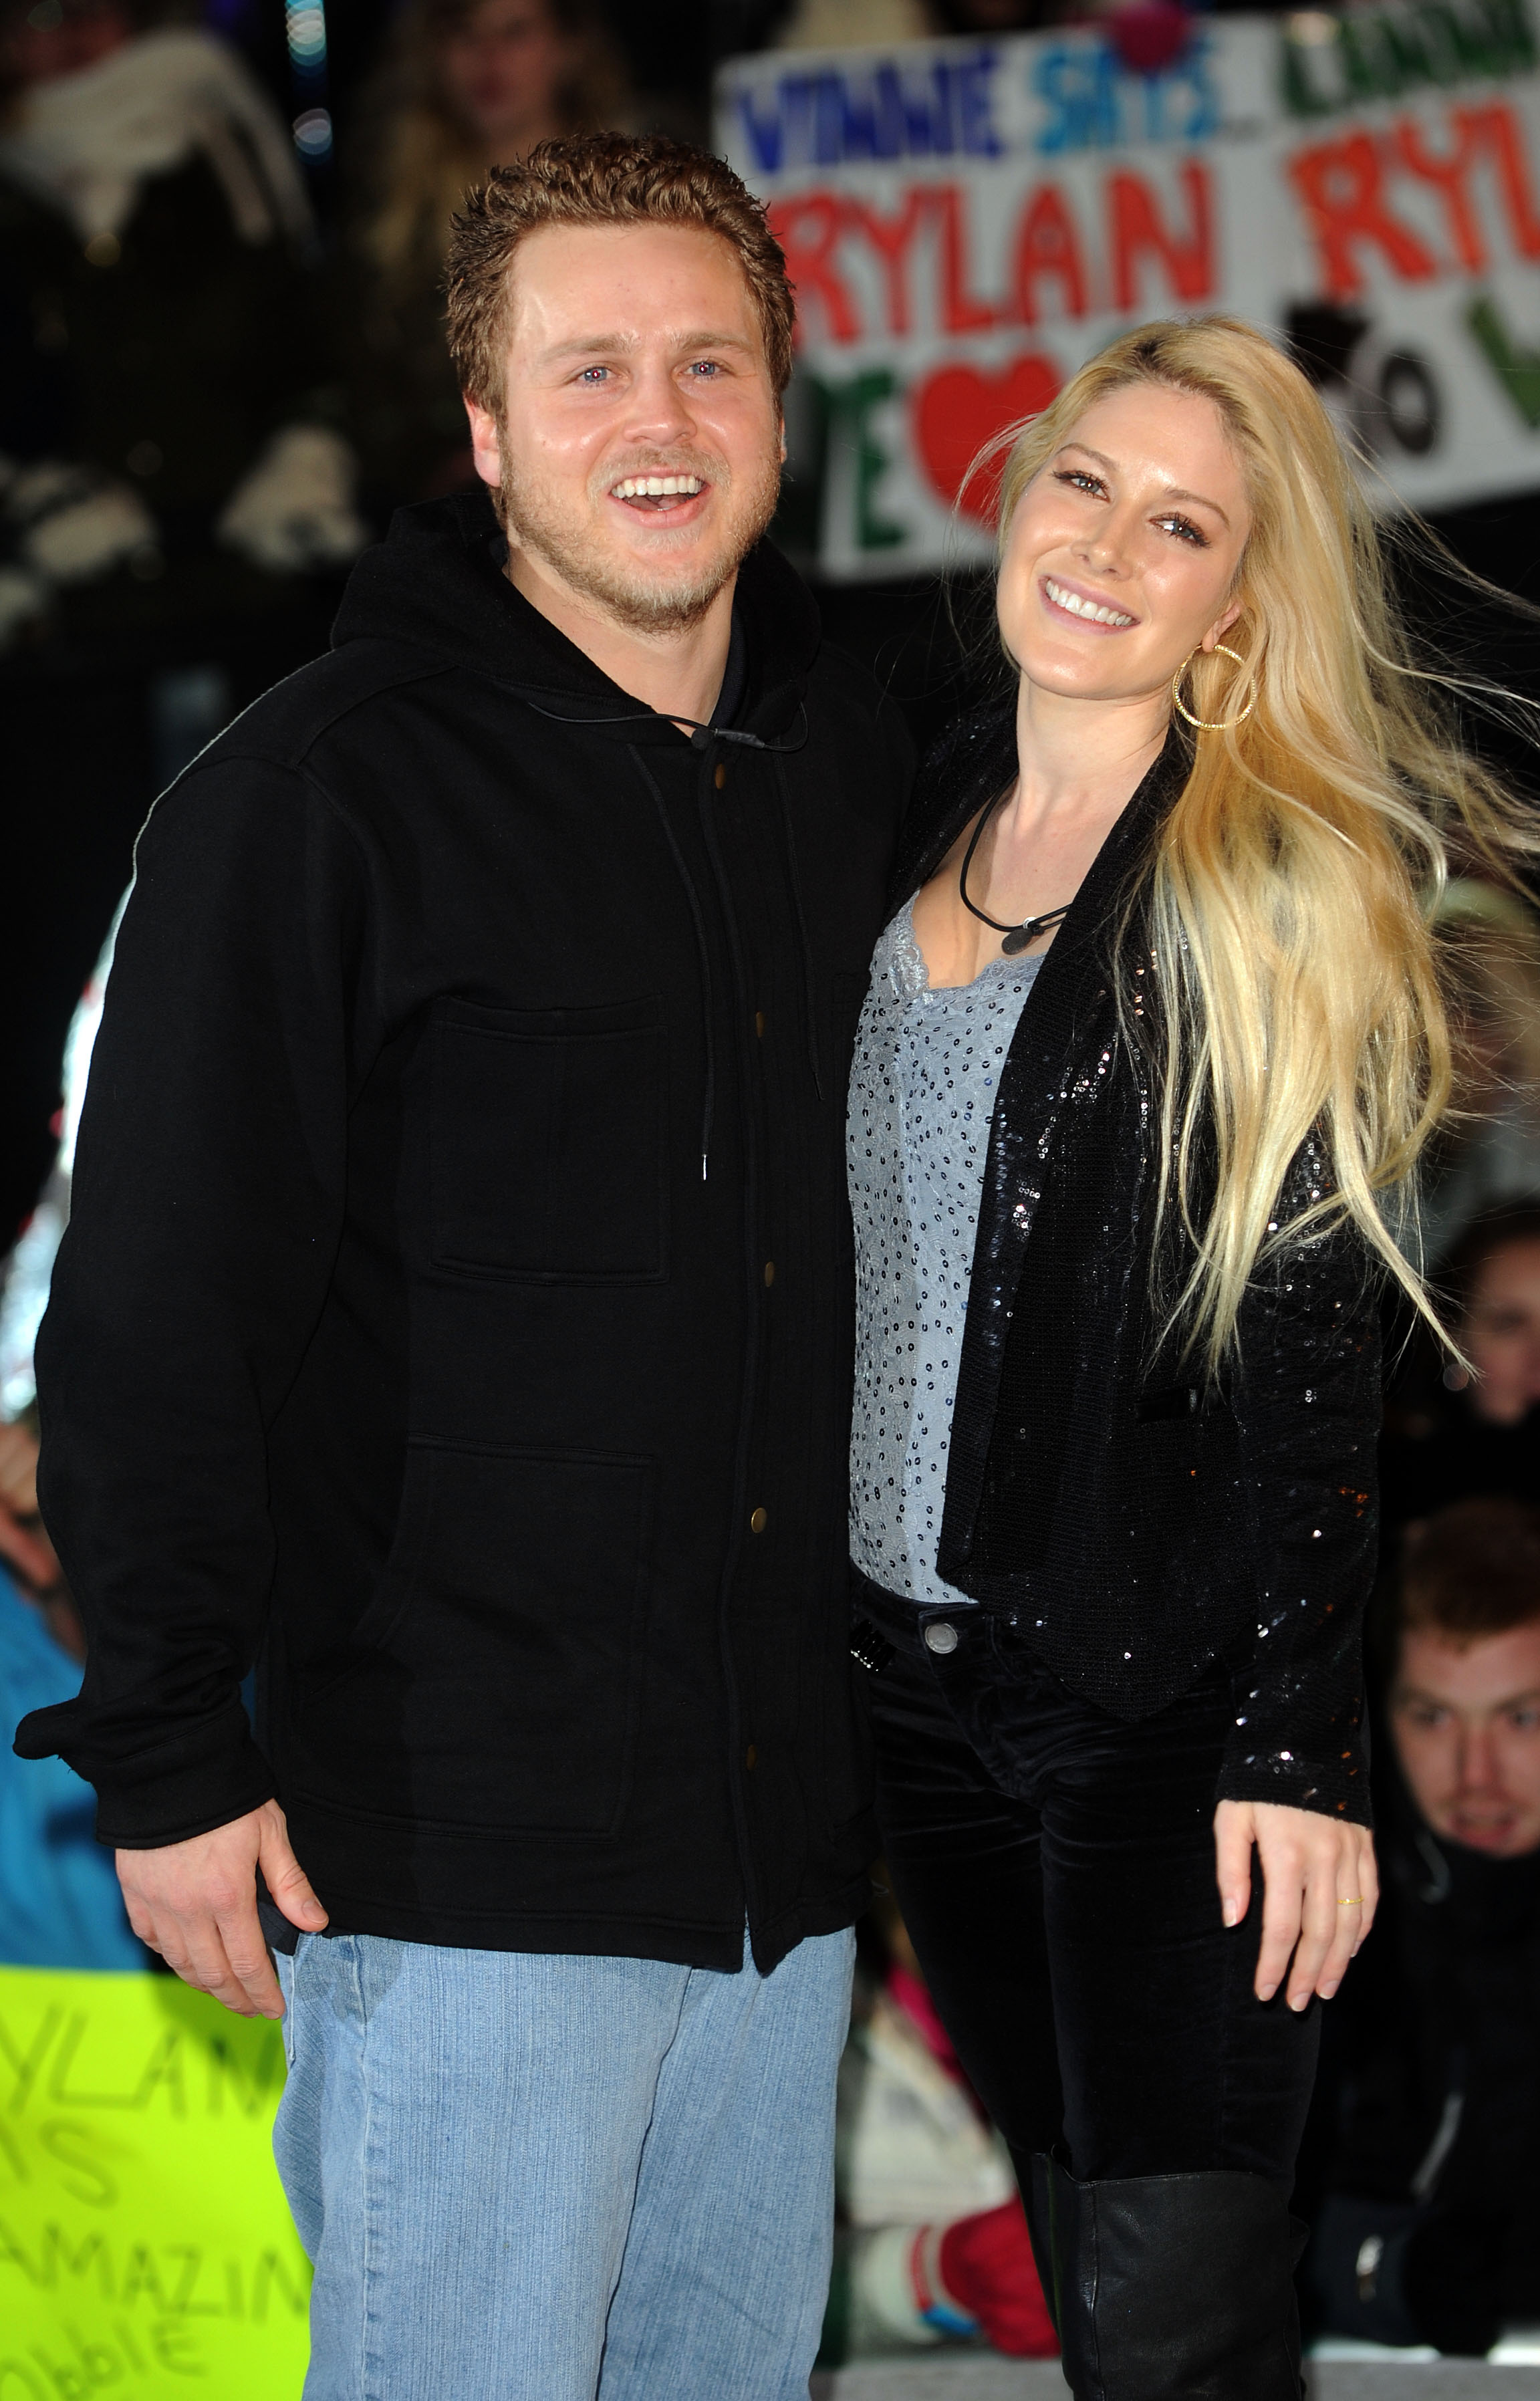 Spencer Pratt & Heidi Montag